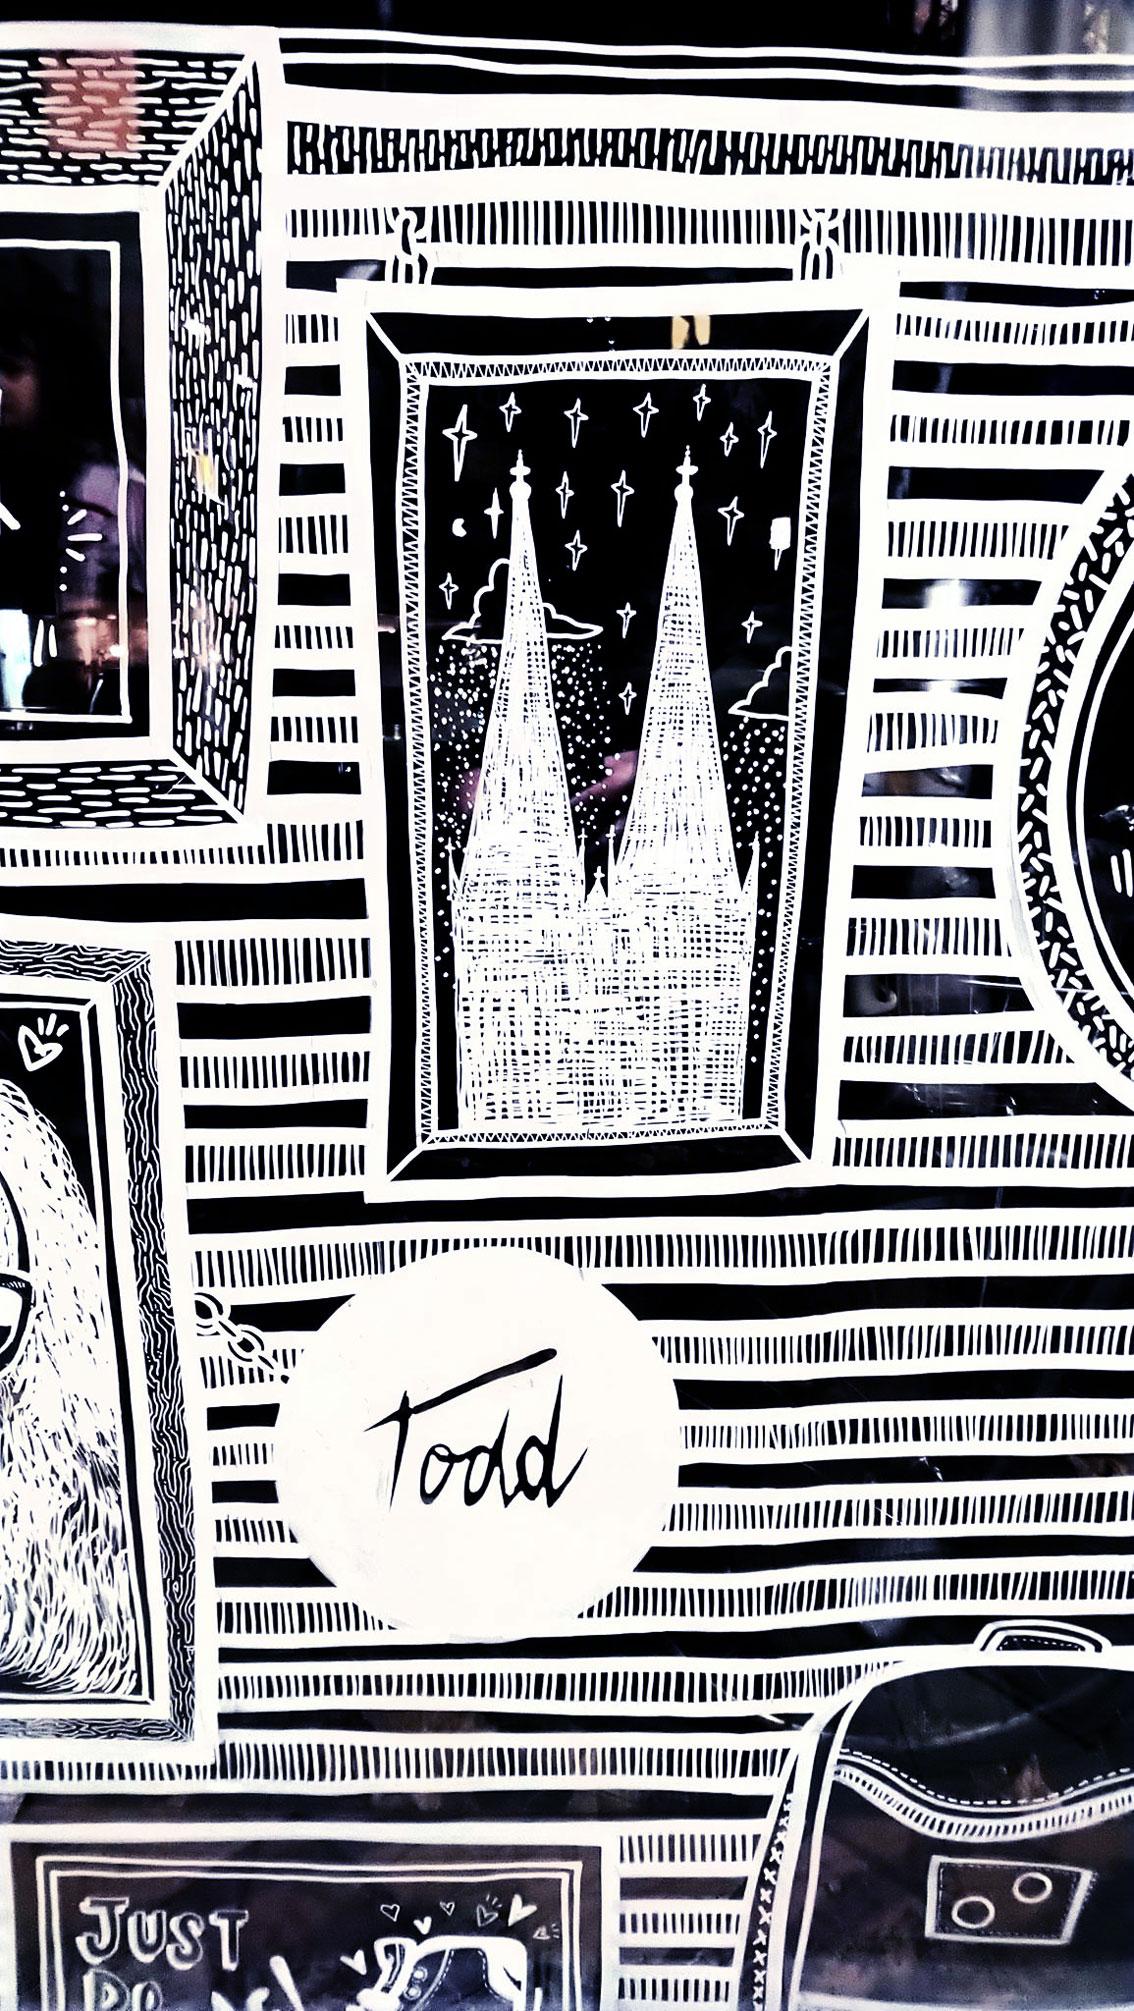 ToddsxLukeEmbden-KolnDom.jpg